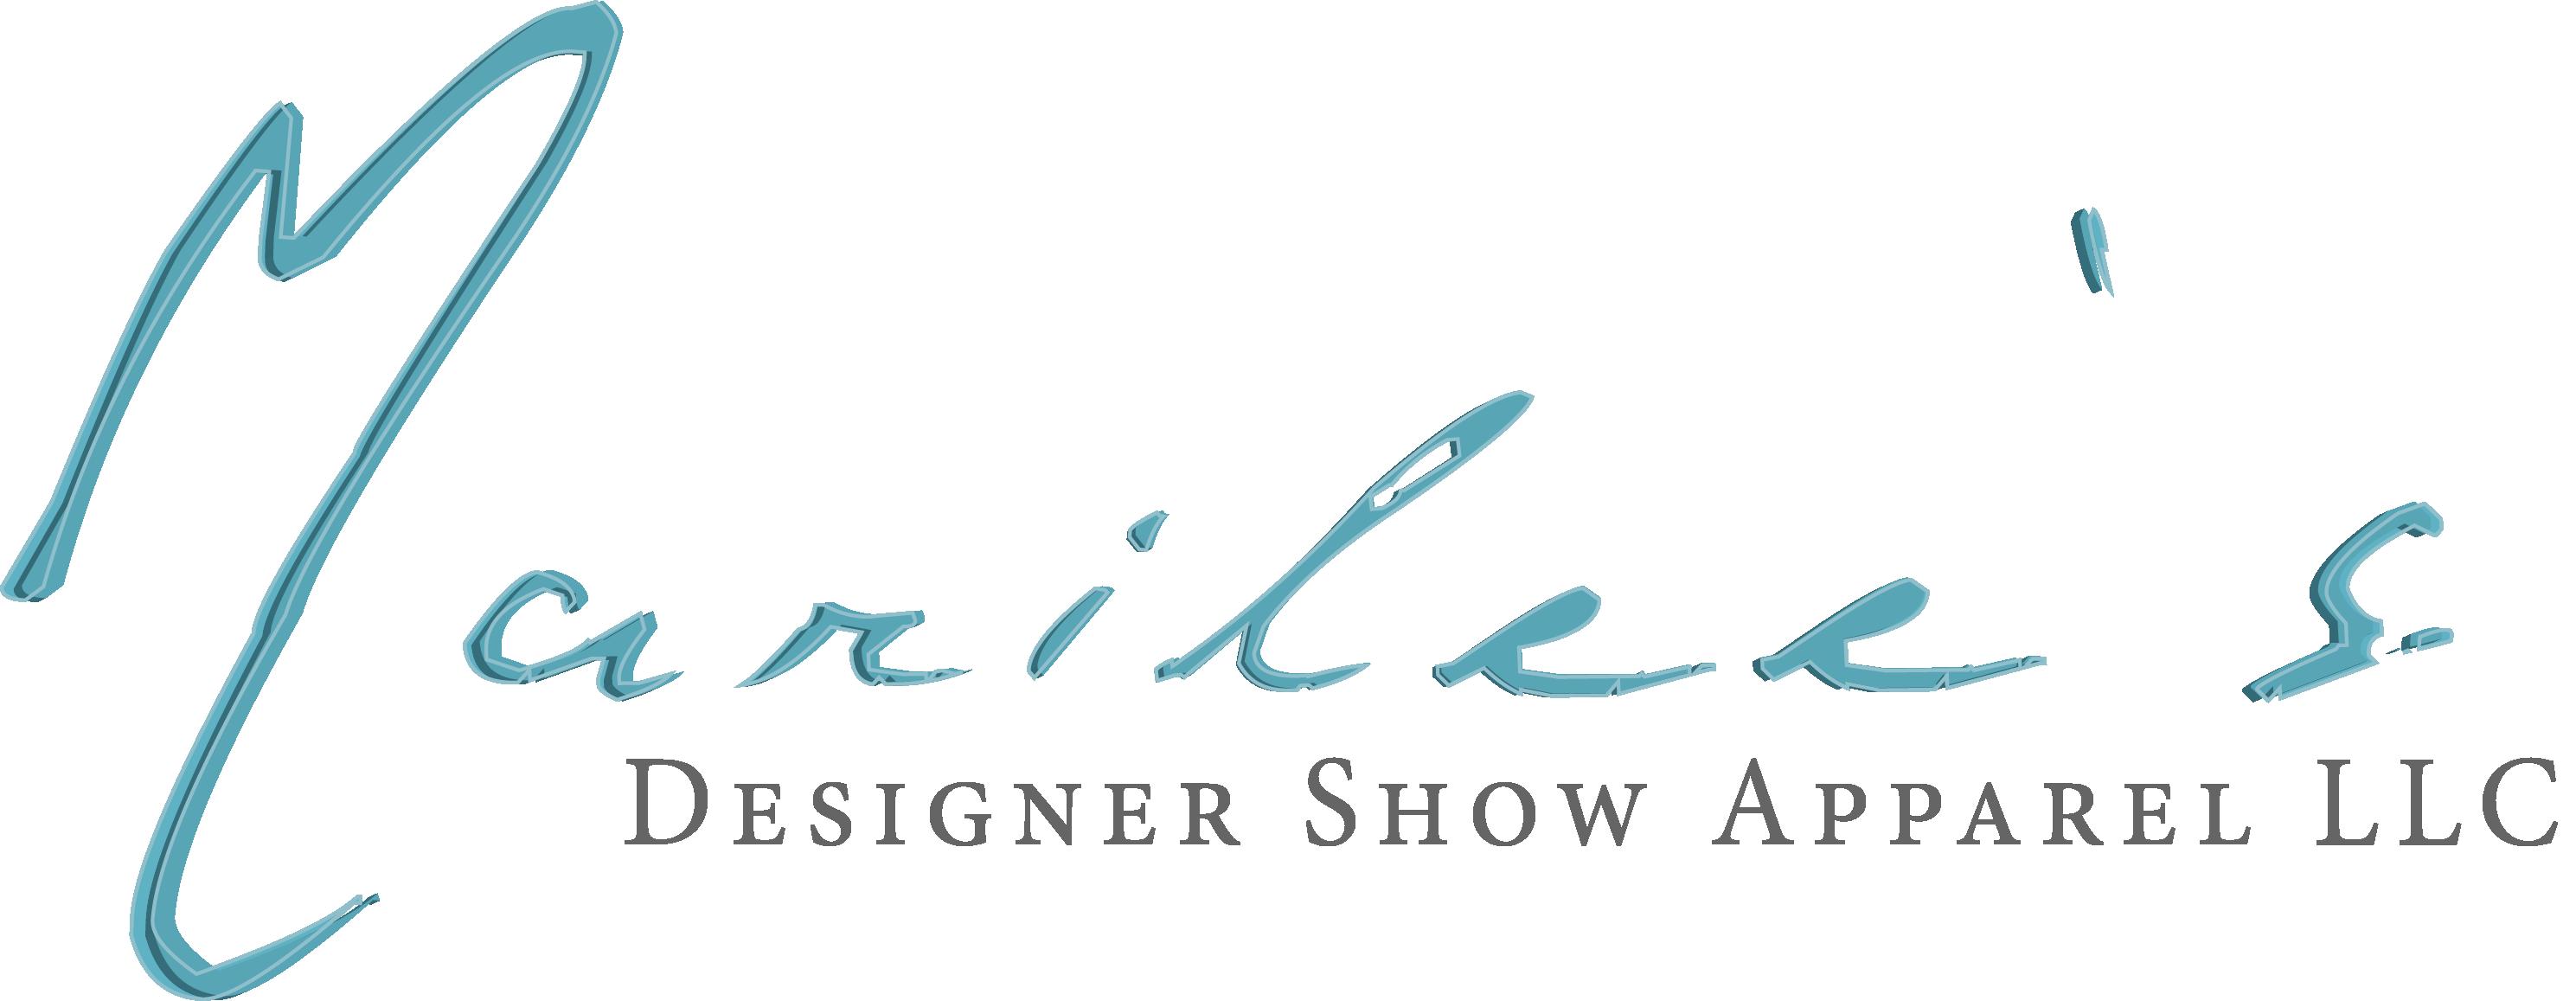 Marilee's Designer Show Apparel LLC